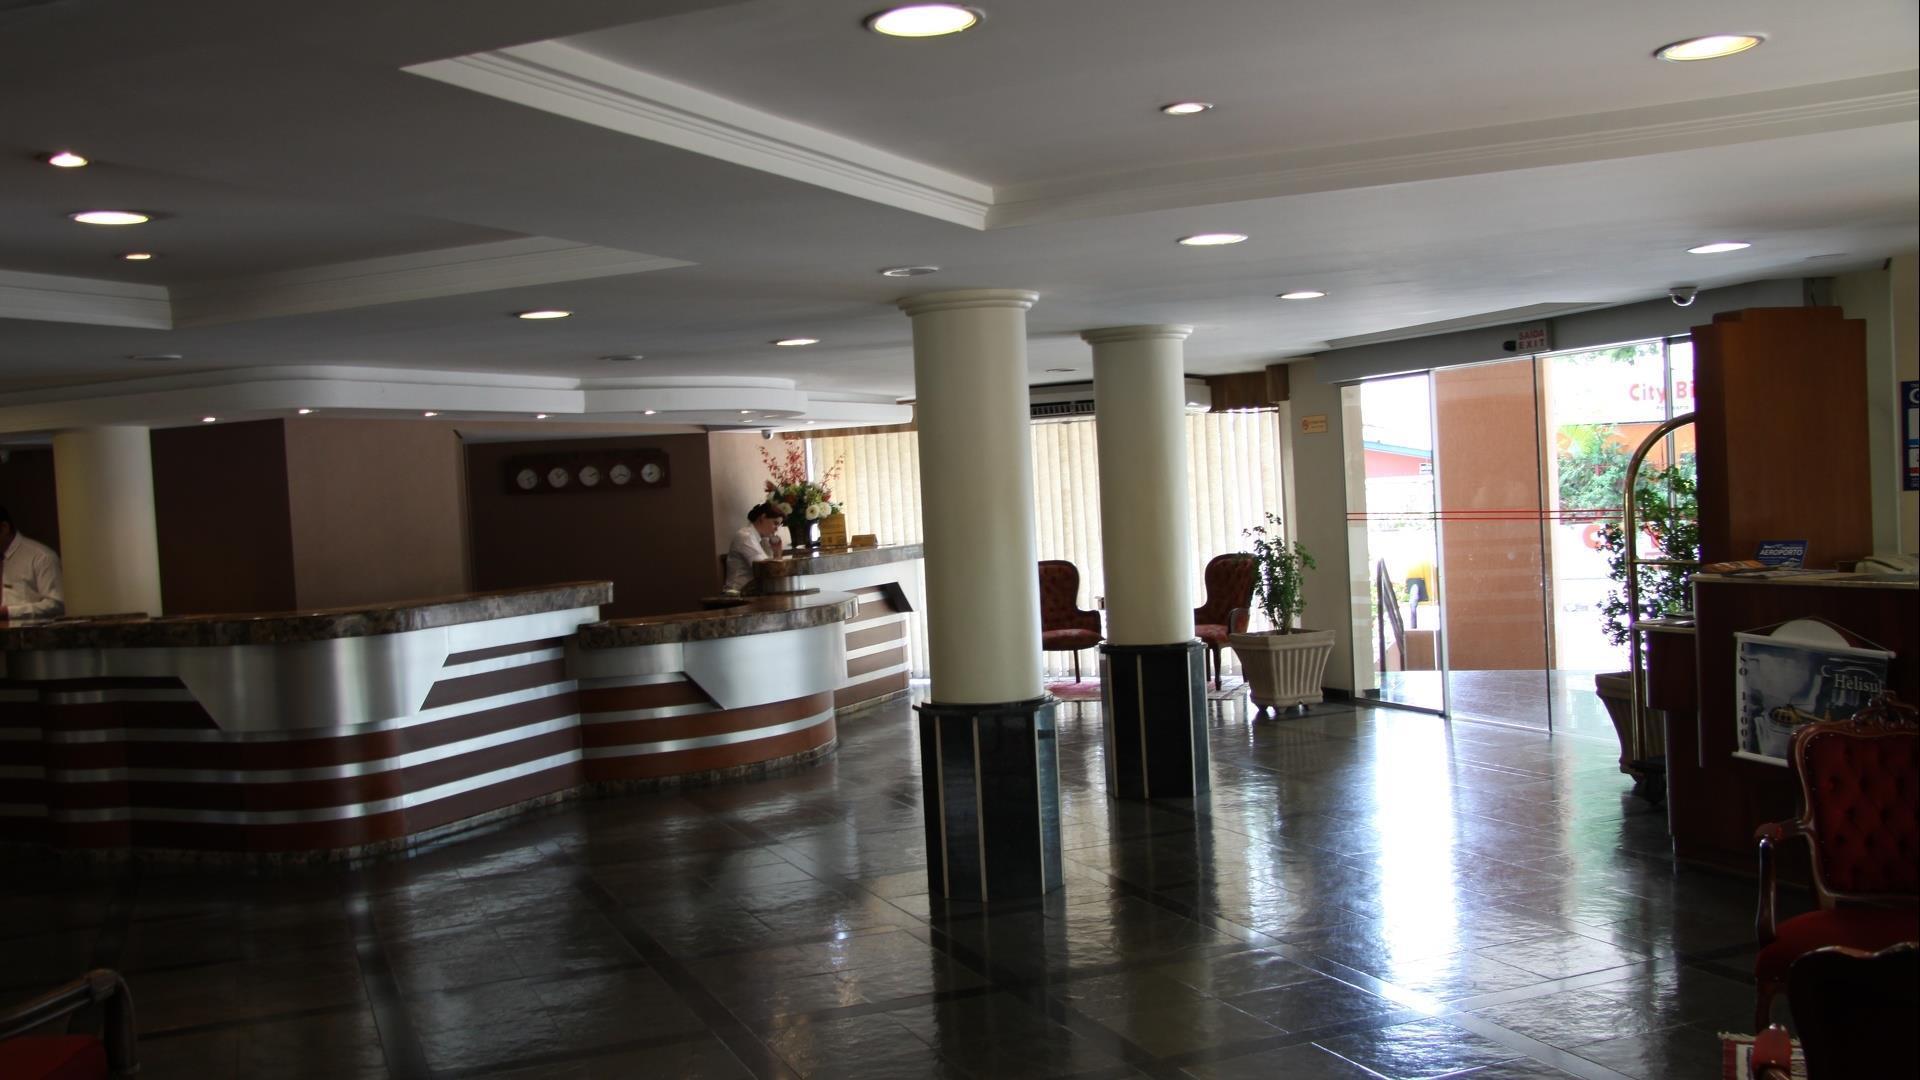 Brasilien Foz do Iguacu: Standard Hotel - Hotel Best Western Taroba